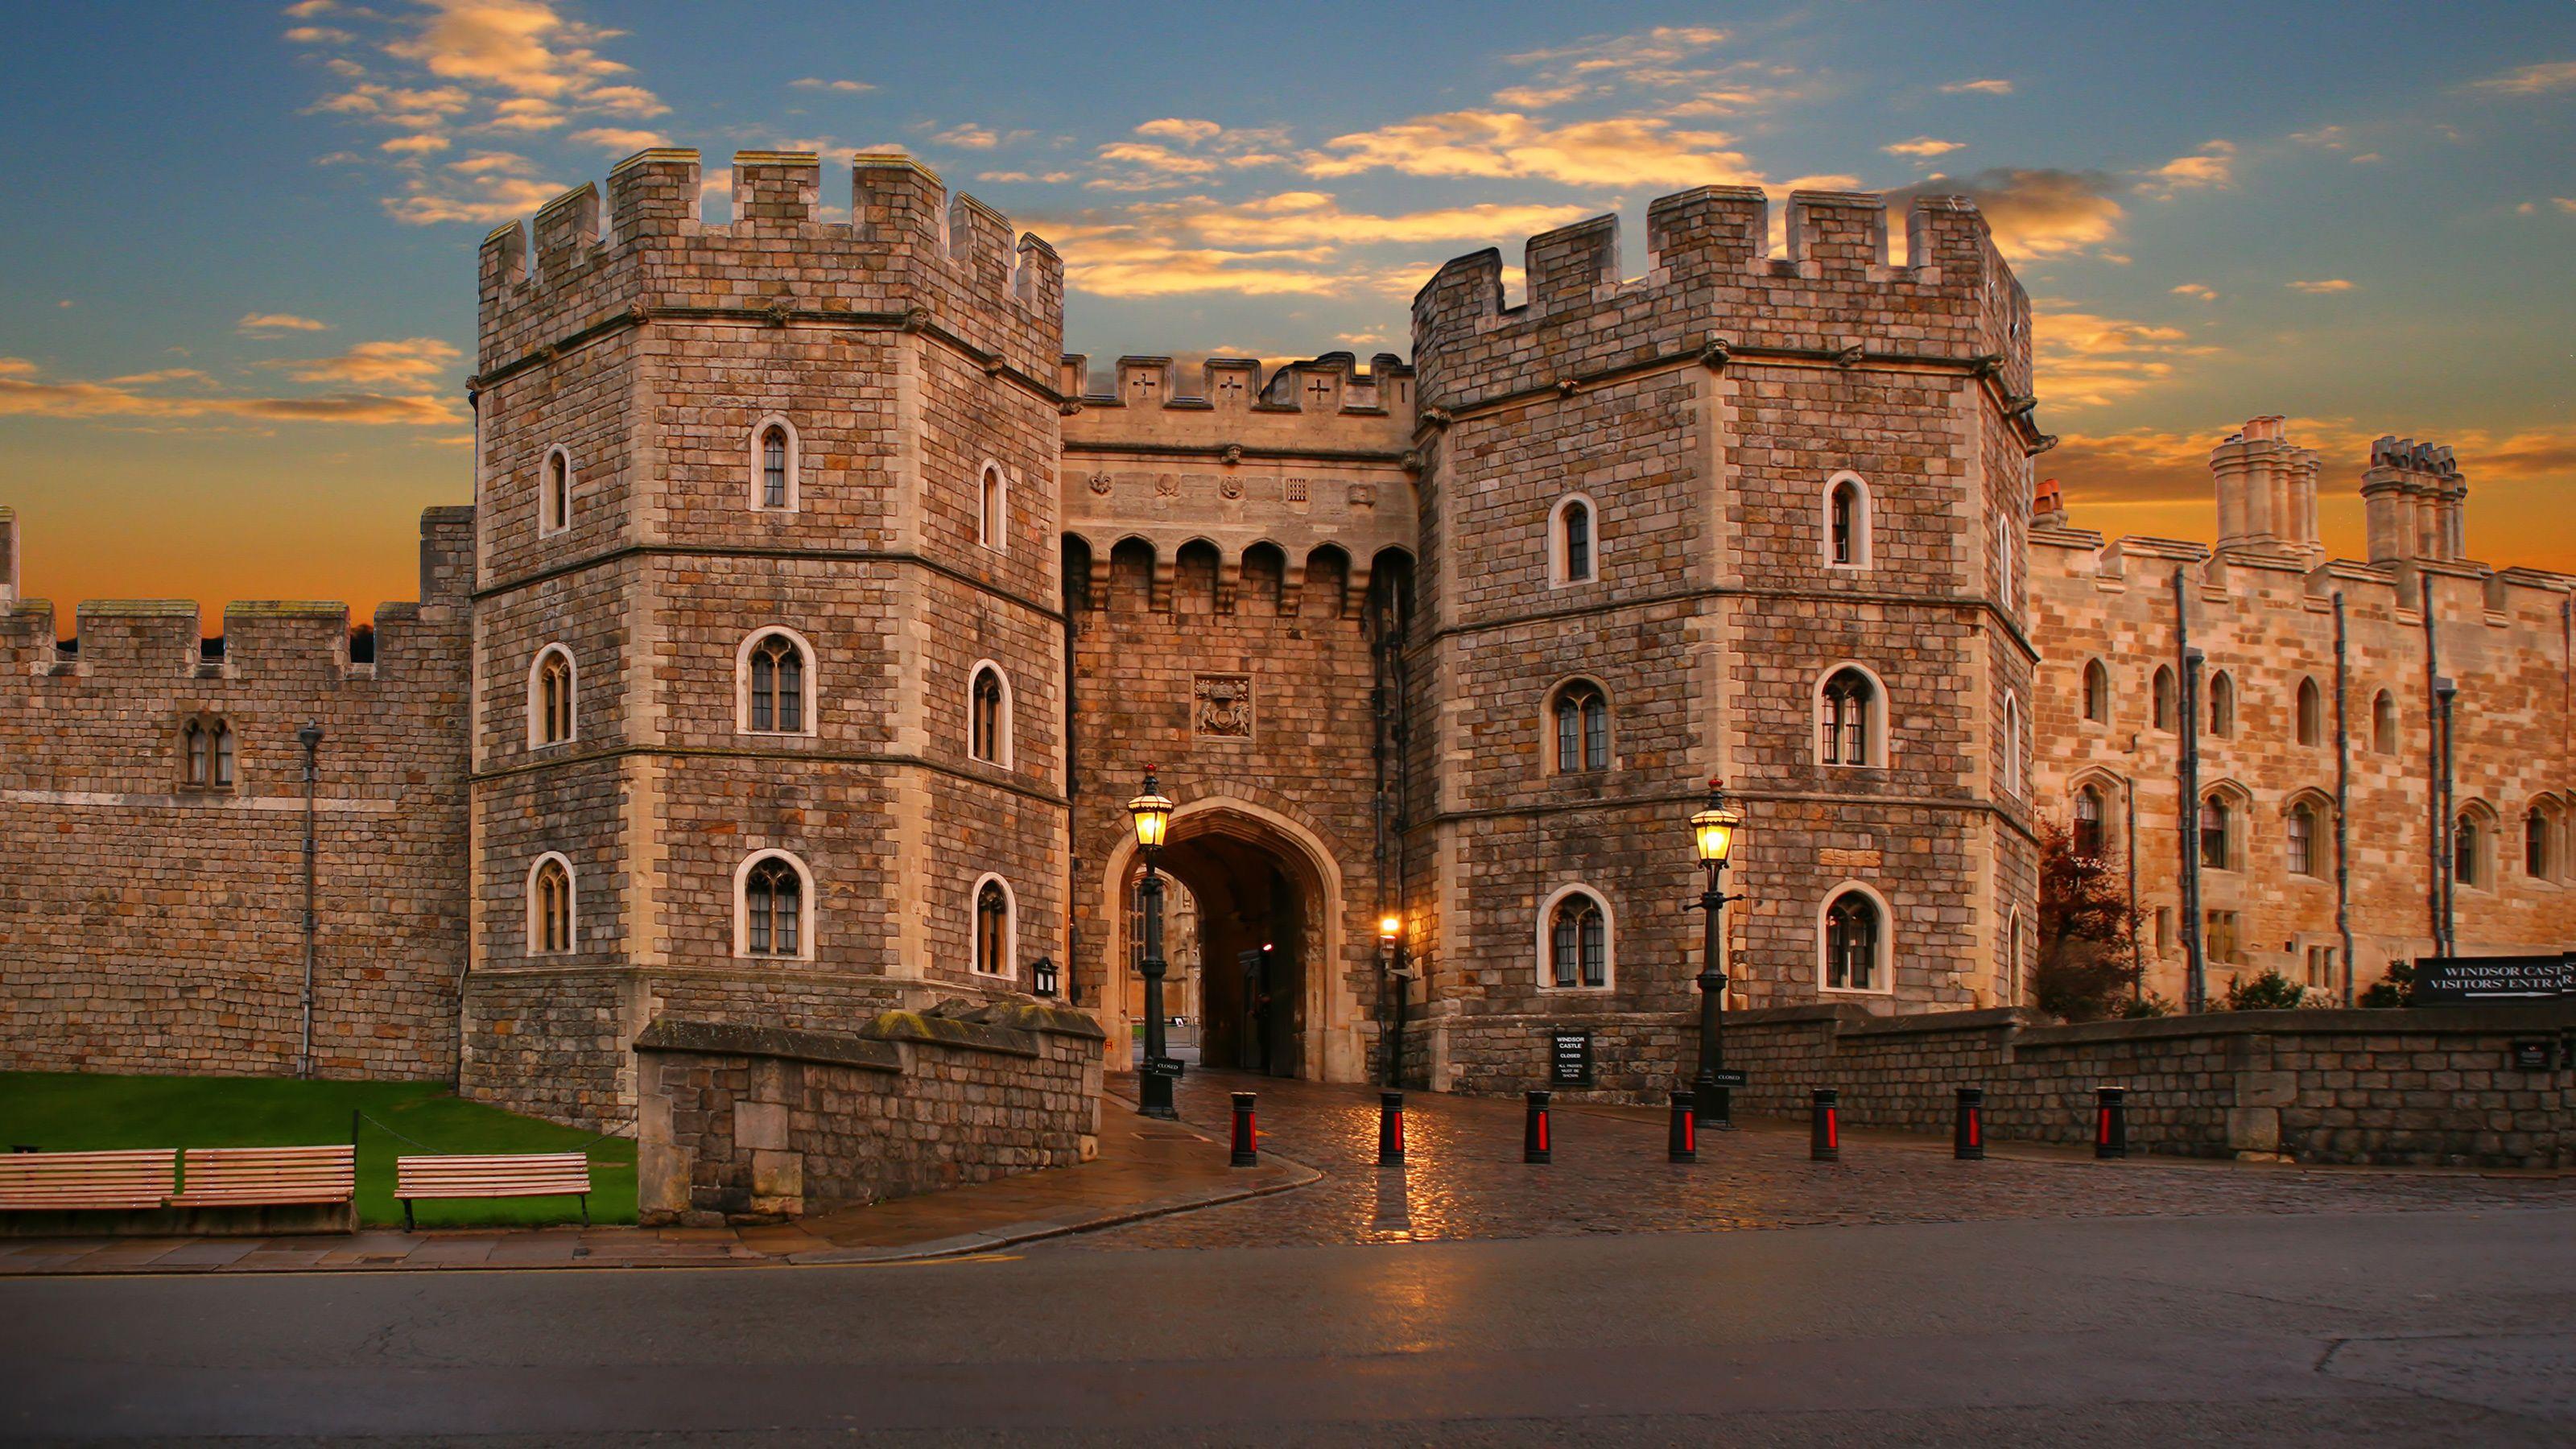 sunset at Windsor Castle in London